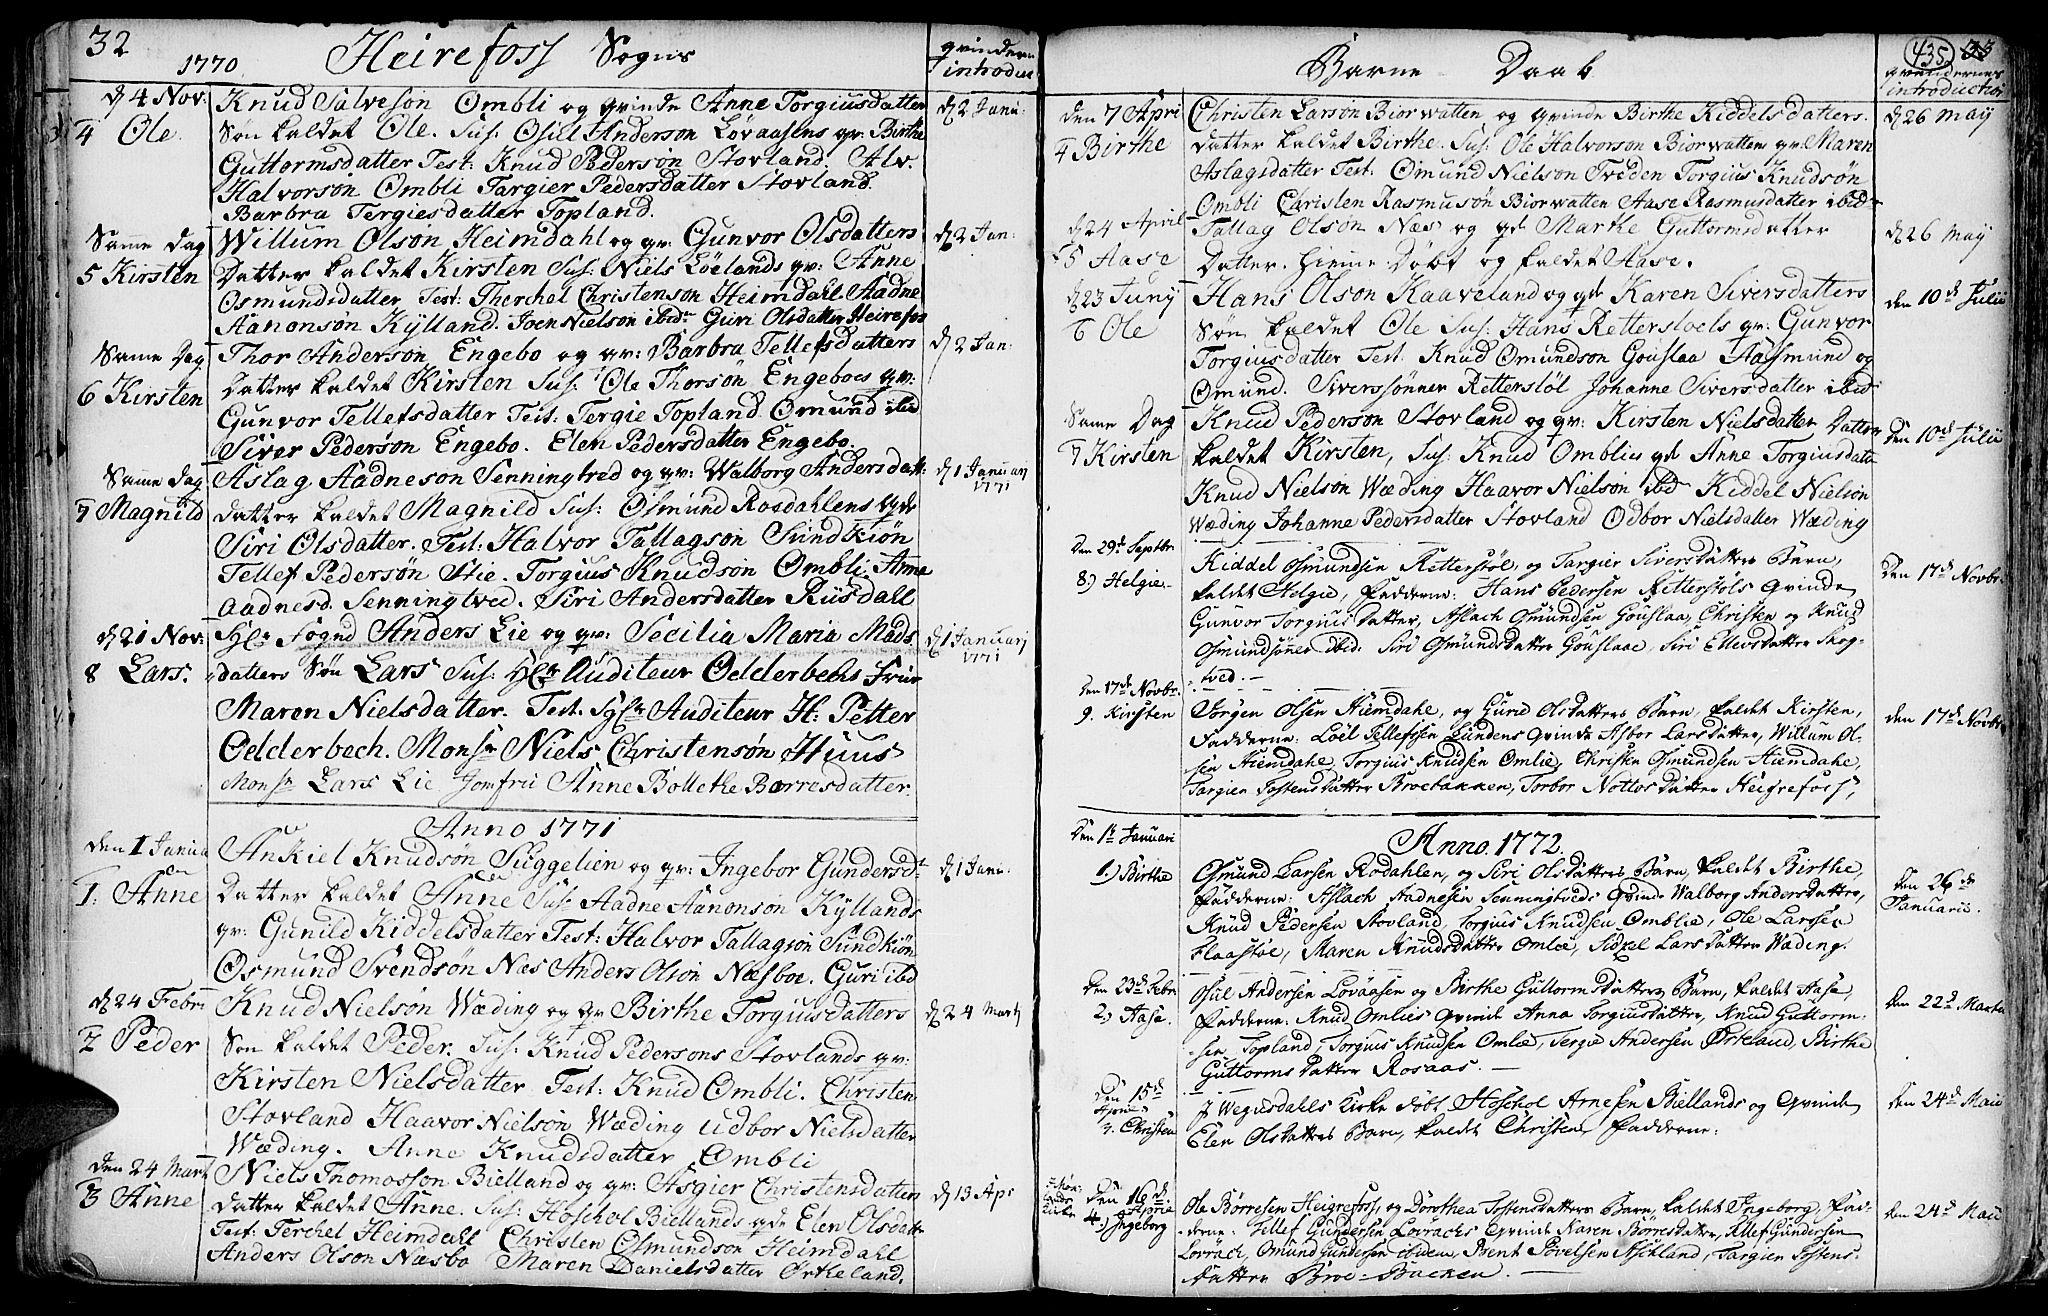 SAK, Hommedal sokneprestkontor, F/Fa/Fab/L0002: Ministerialbok nr. A 2 /3, 1740-1821, s. 435